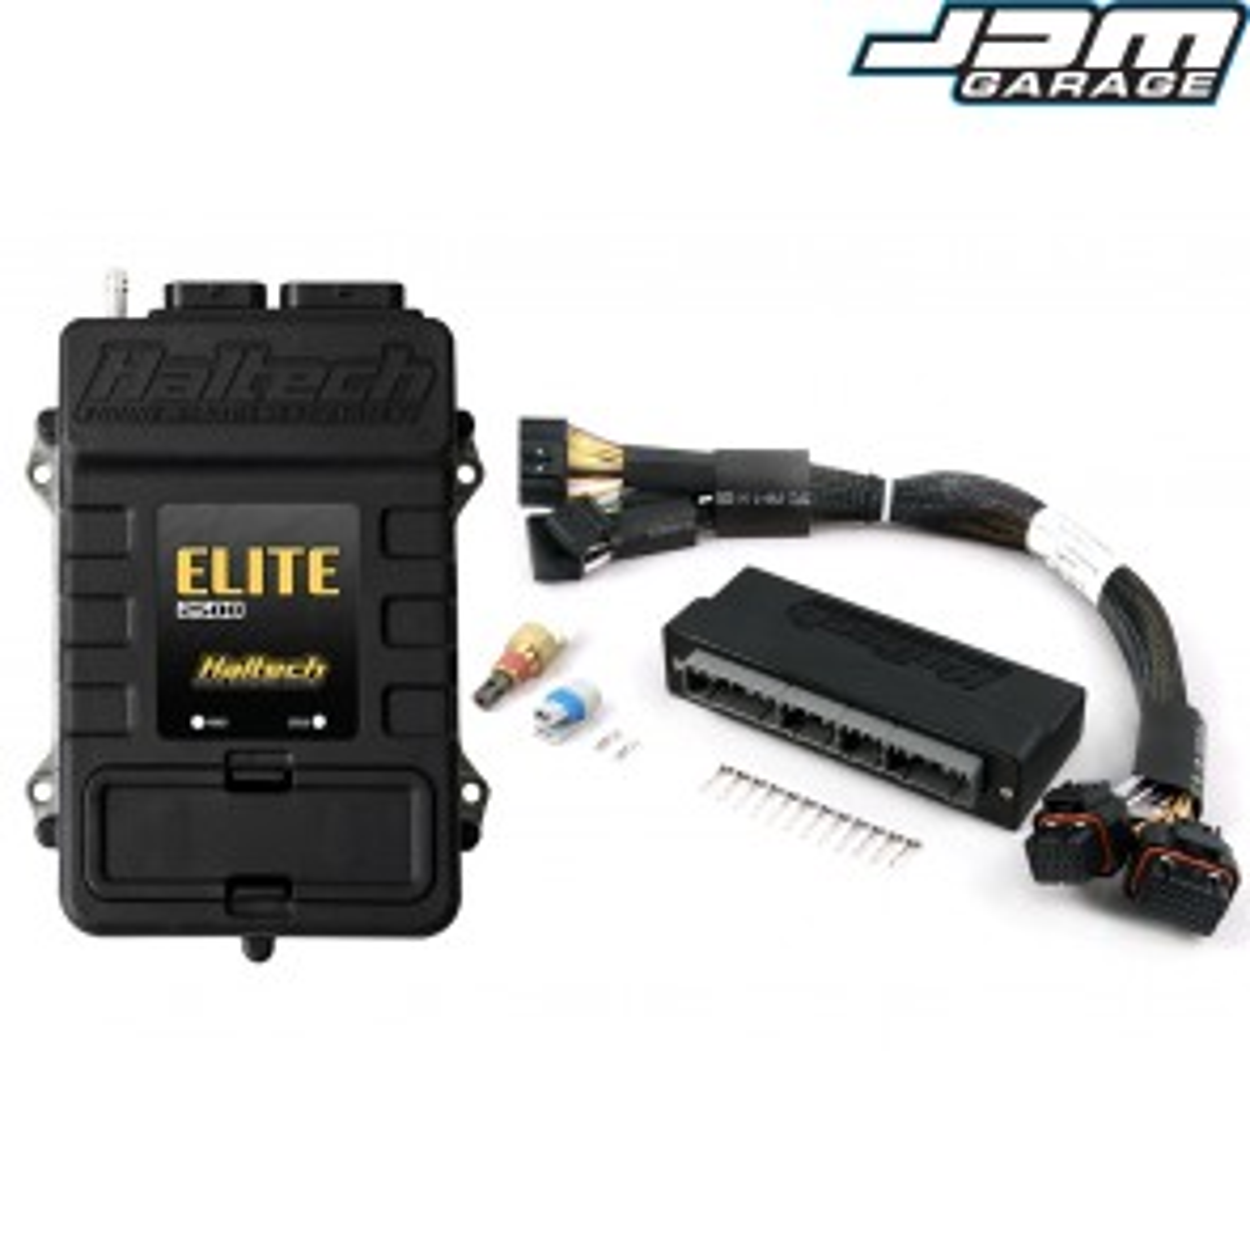 Haltech Elite 2500+ ECU Mitsubishi Lancer Evolution Evo 8 VIII MR / 9 IX Mivec With Plug 'n' Play Adaptor Harness Kit